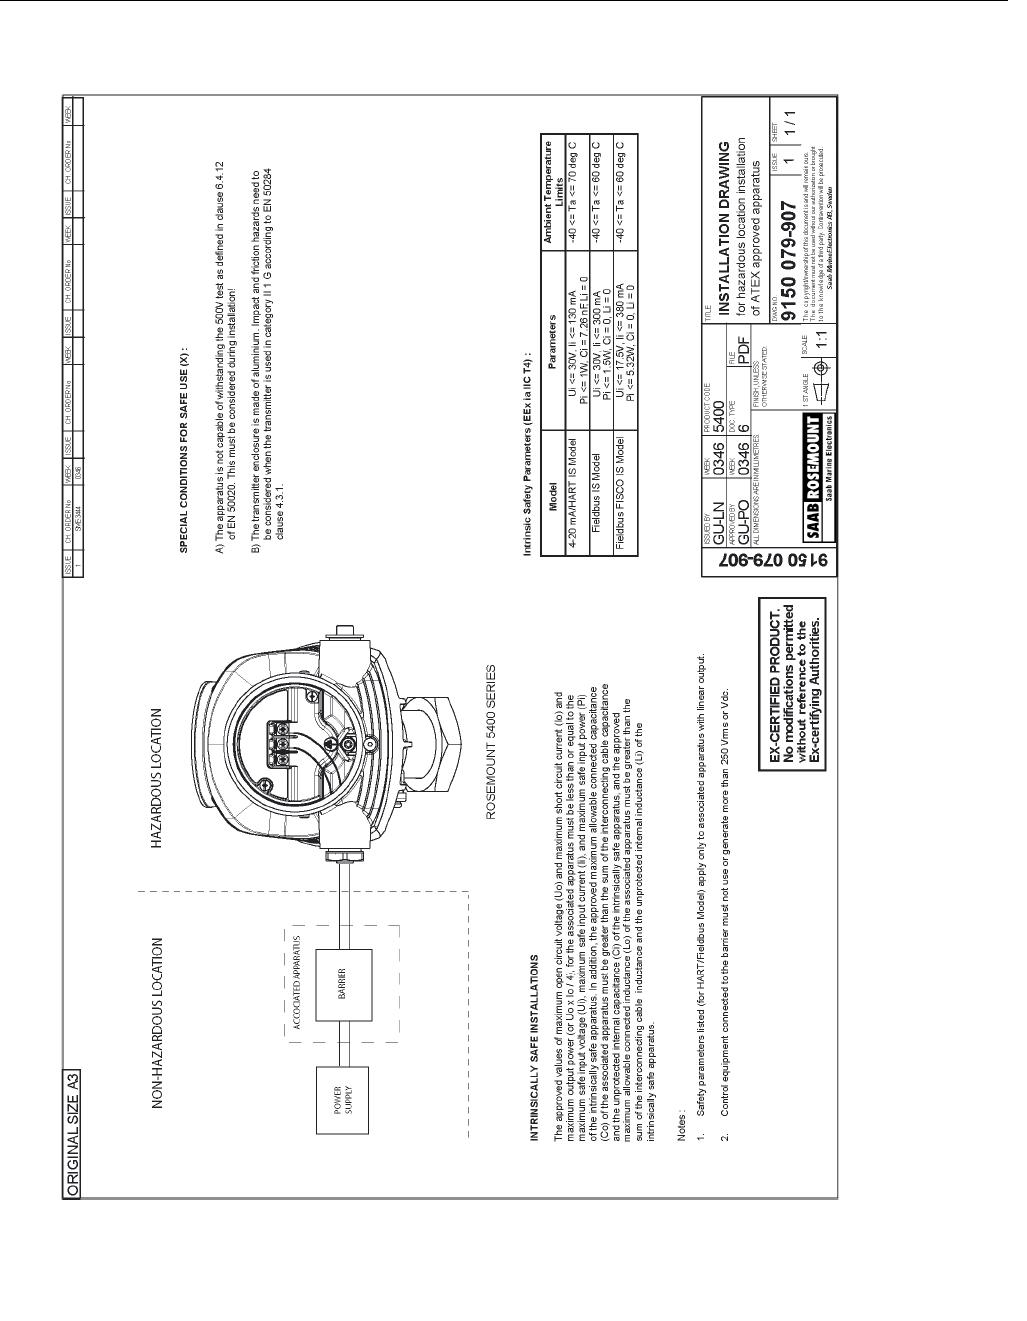 Rosemount Tank Radar 5402 Radar Level Gauge User Manual